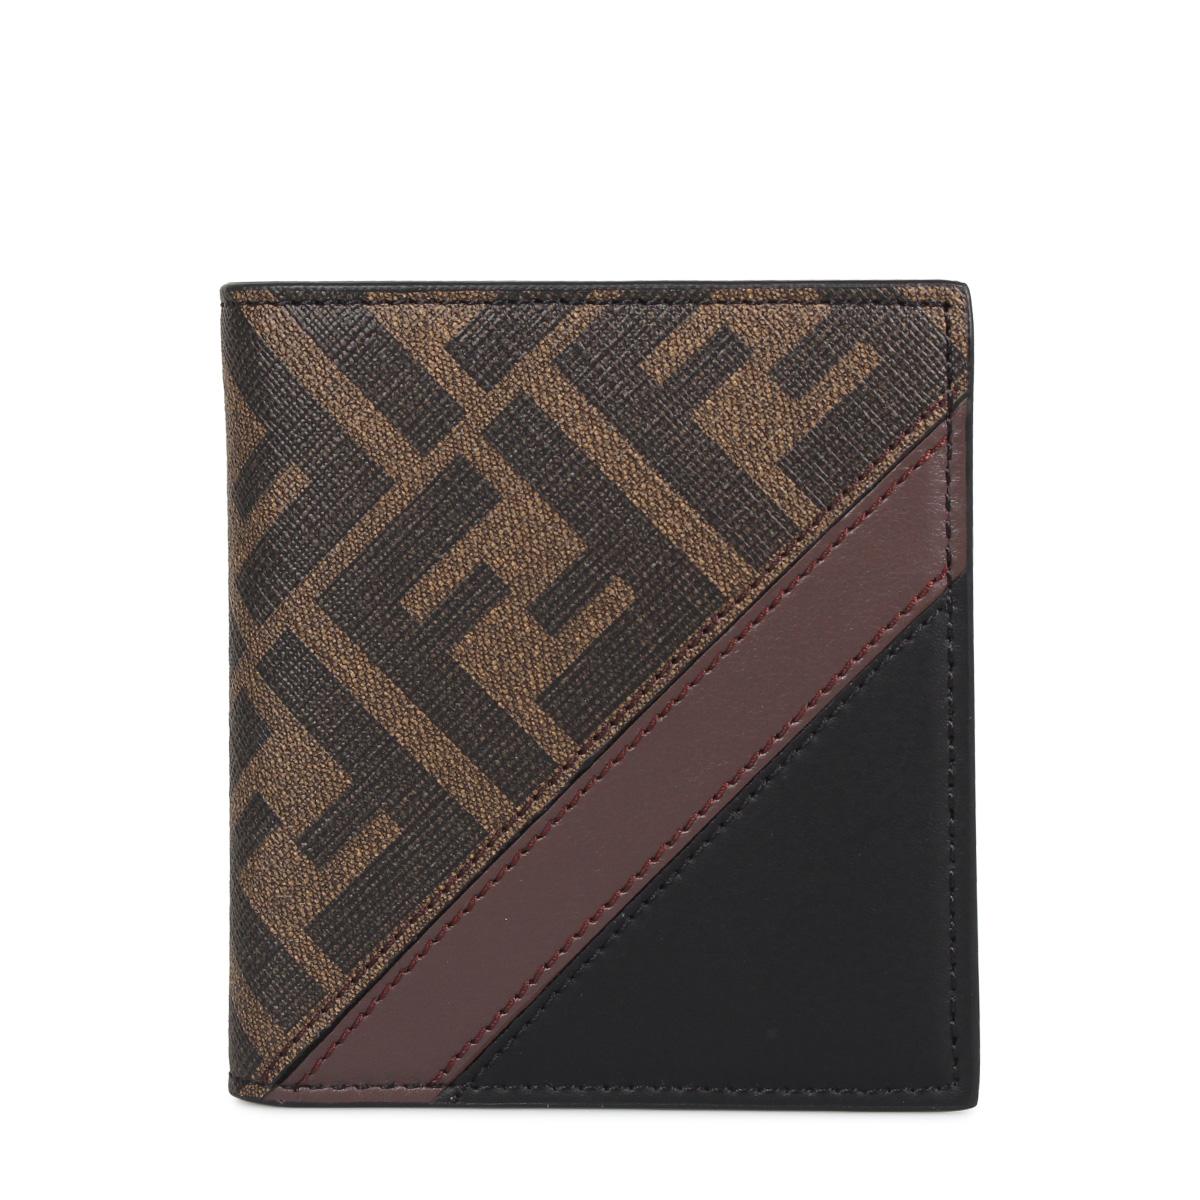 FENDI SLIM WALLET 8CC フェンディ 財布 二つ折り メンズ ブラウン 7M0274